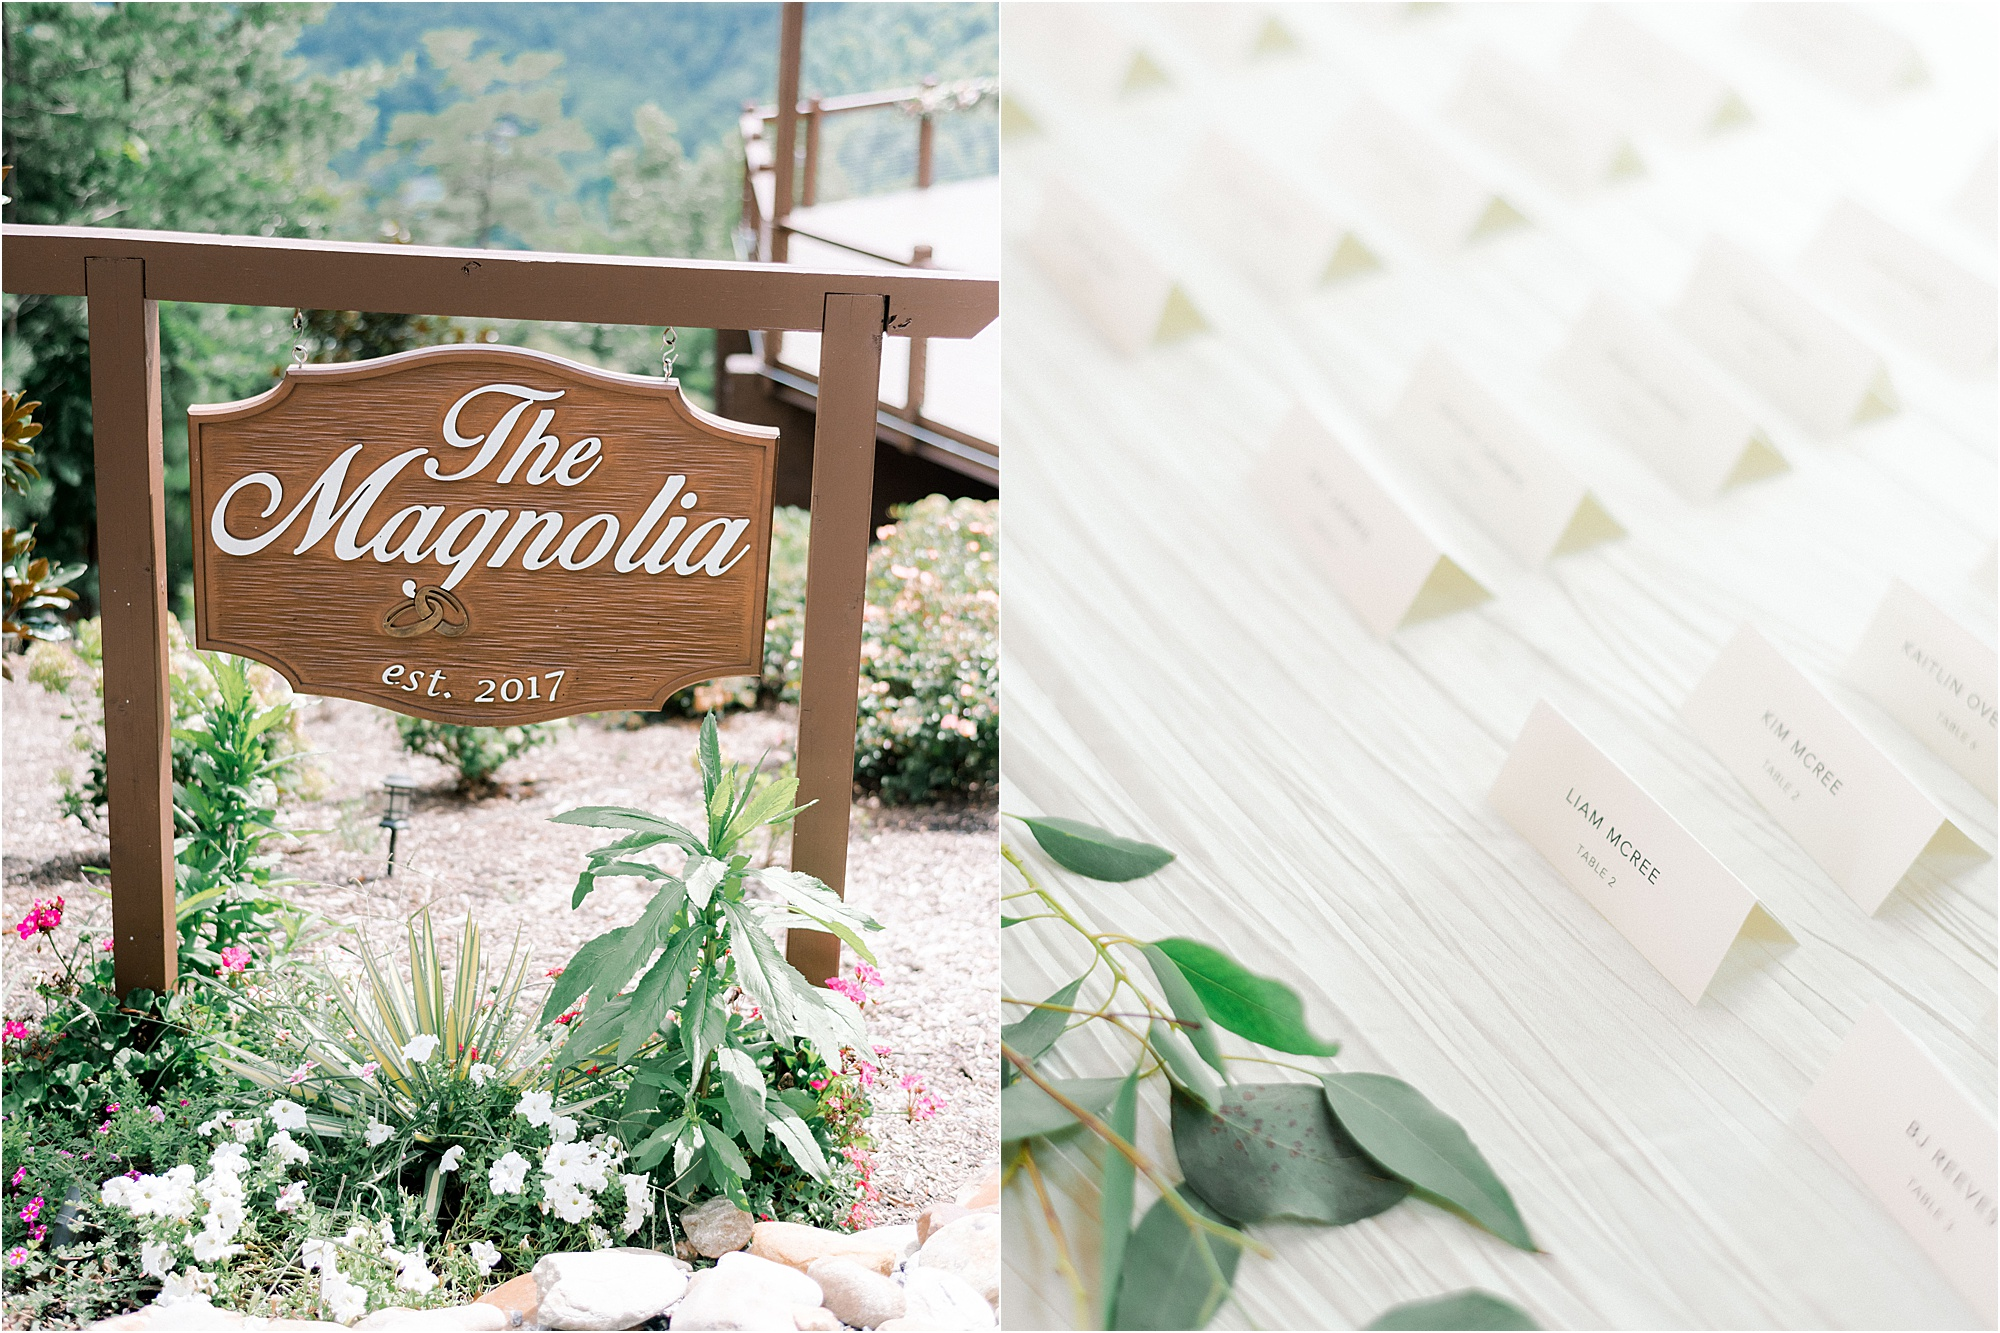 The Magnolia Venue sign and escort cards